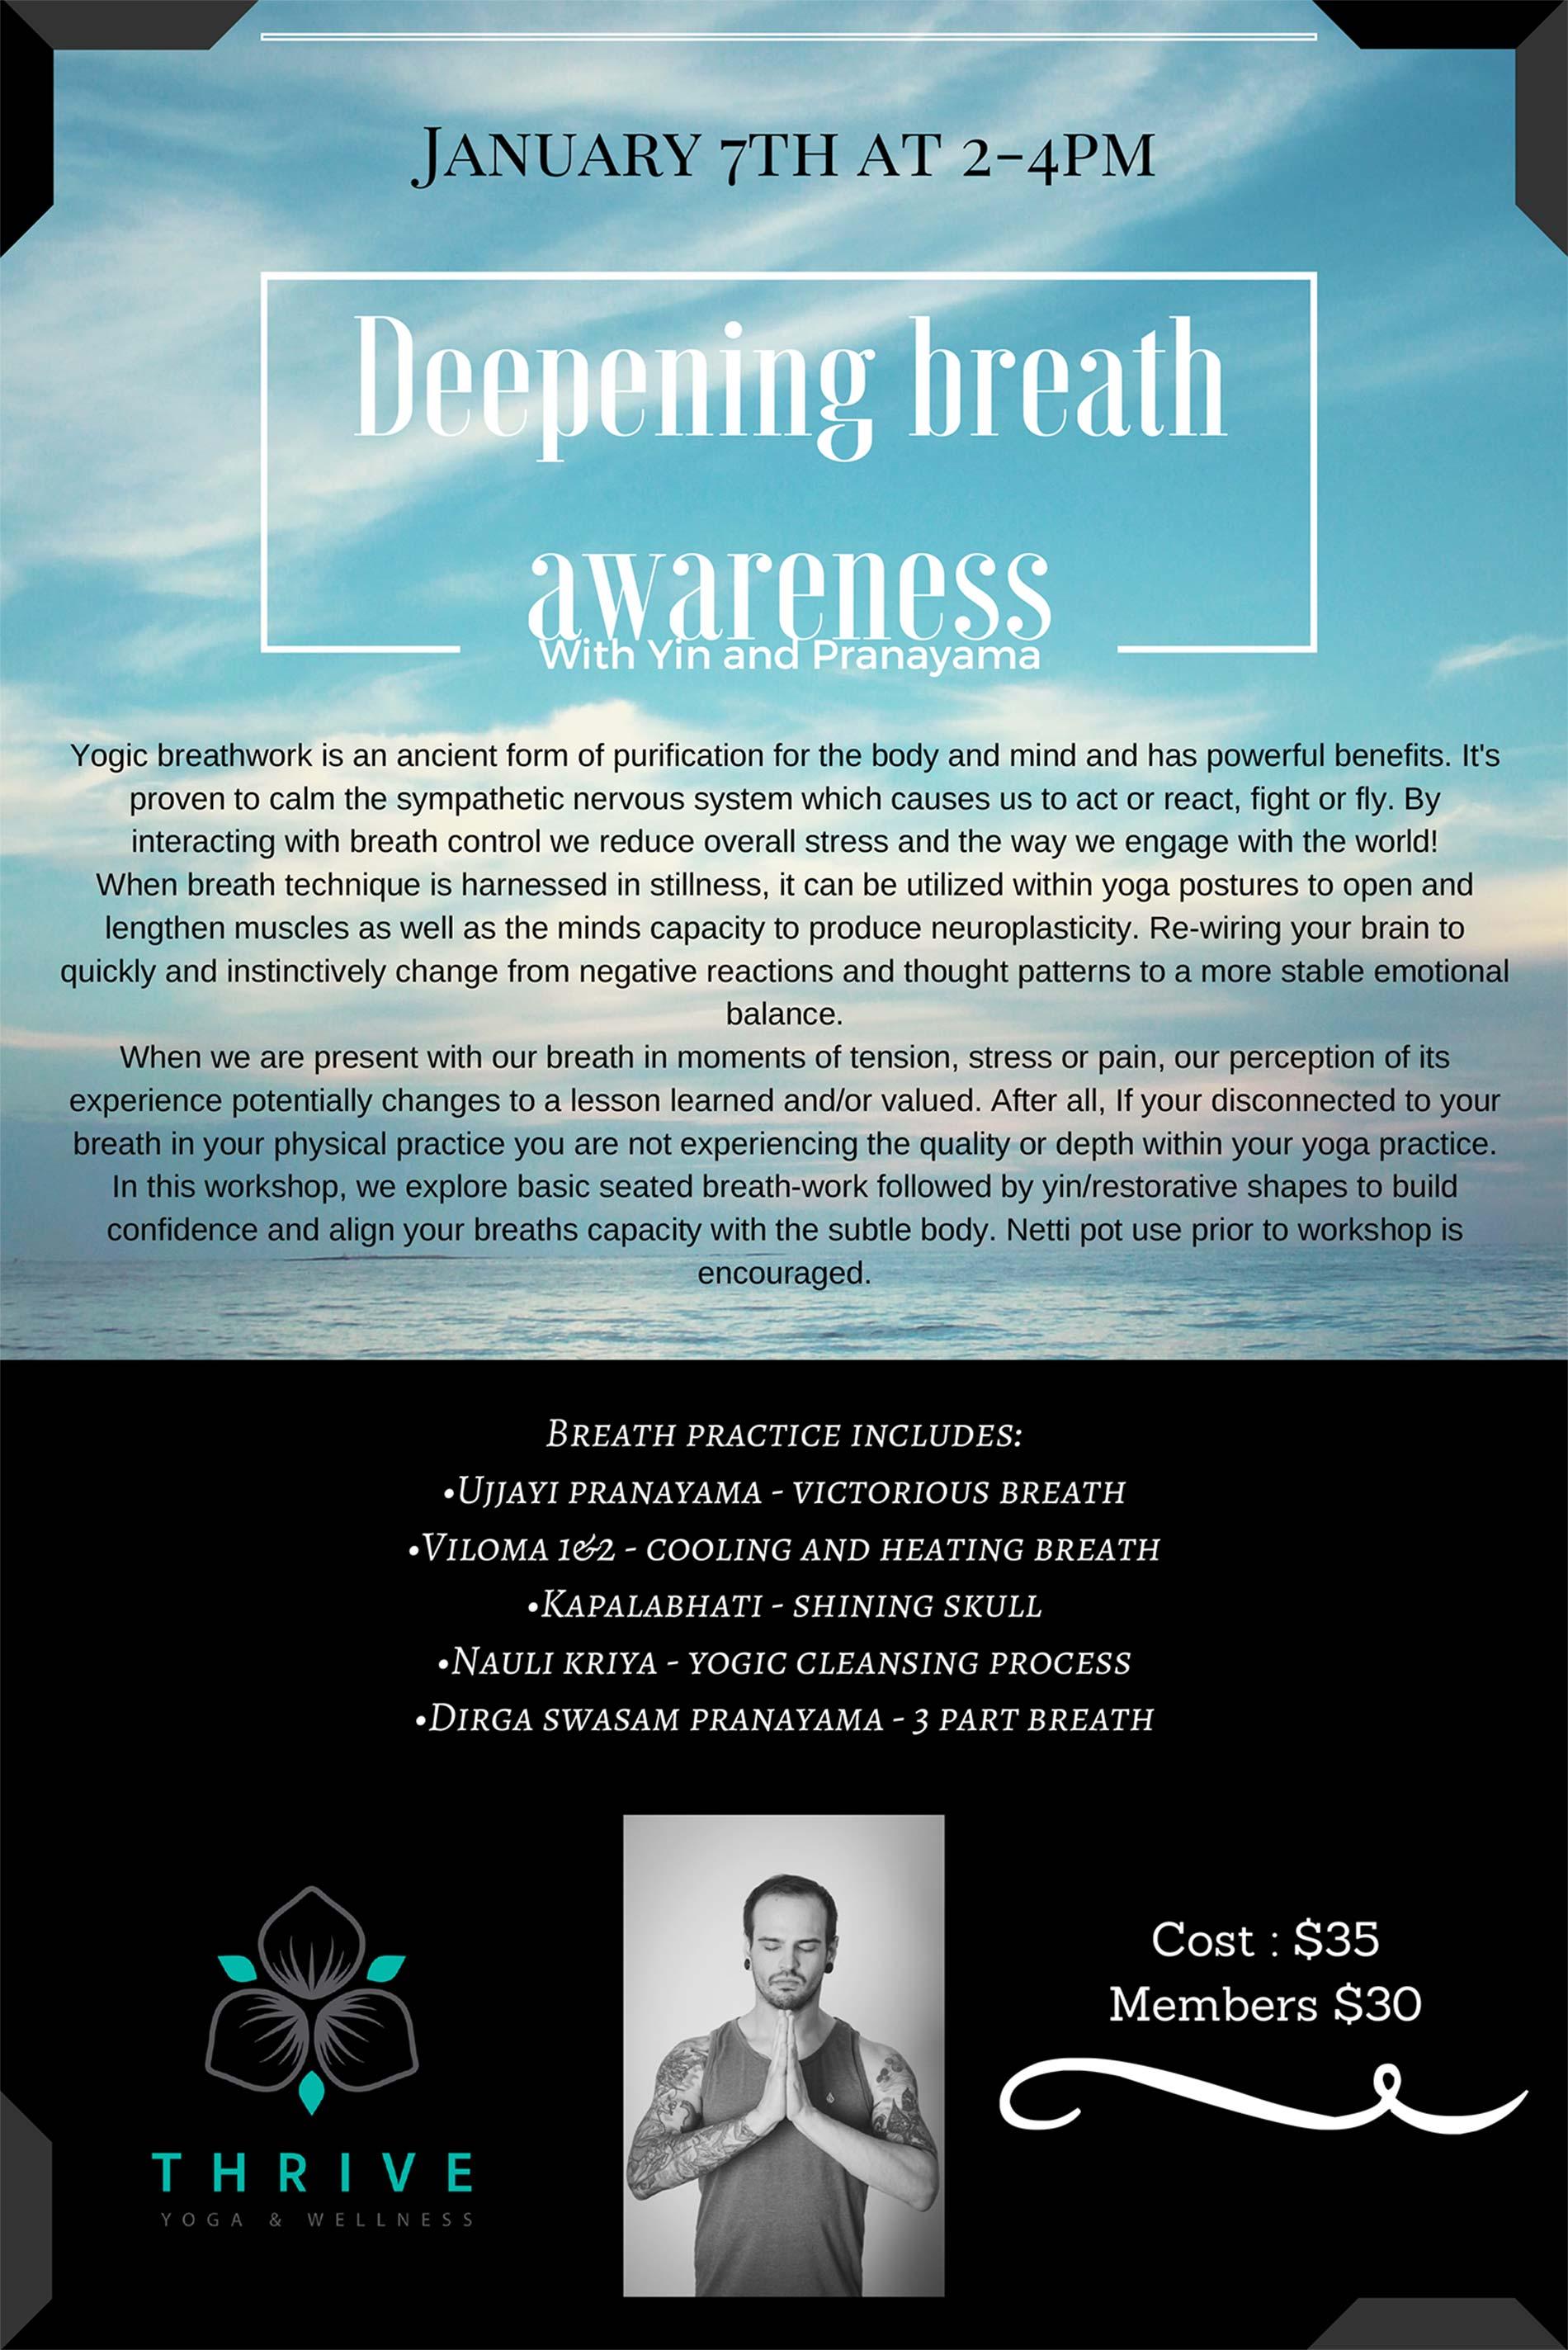 Deep Breath Workshop with Jordan Castellanos and Thrive Yoga